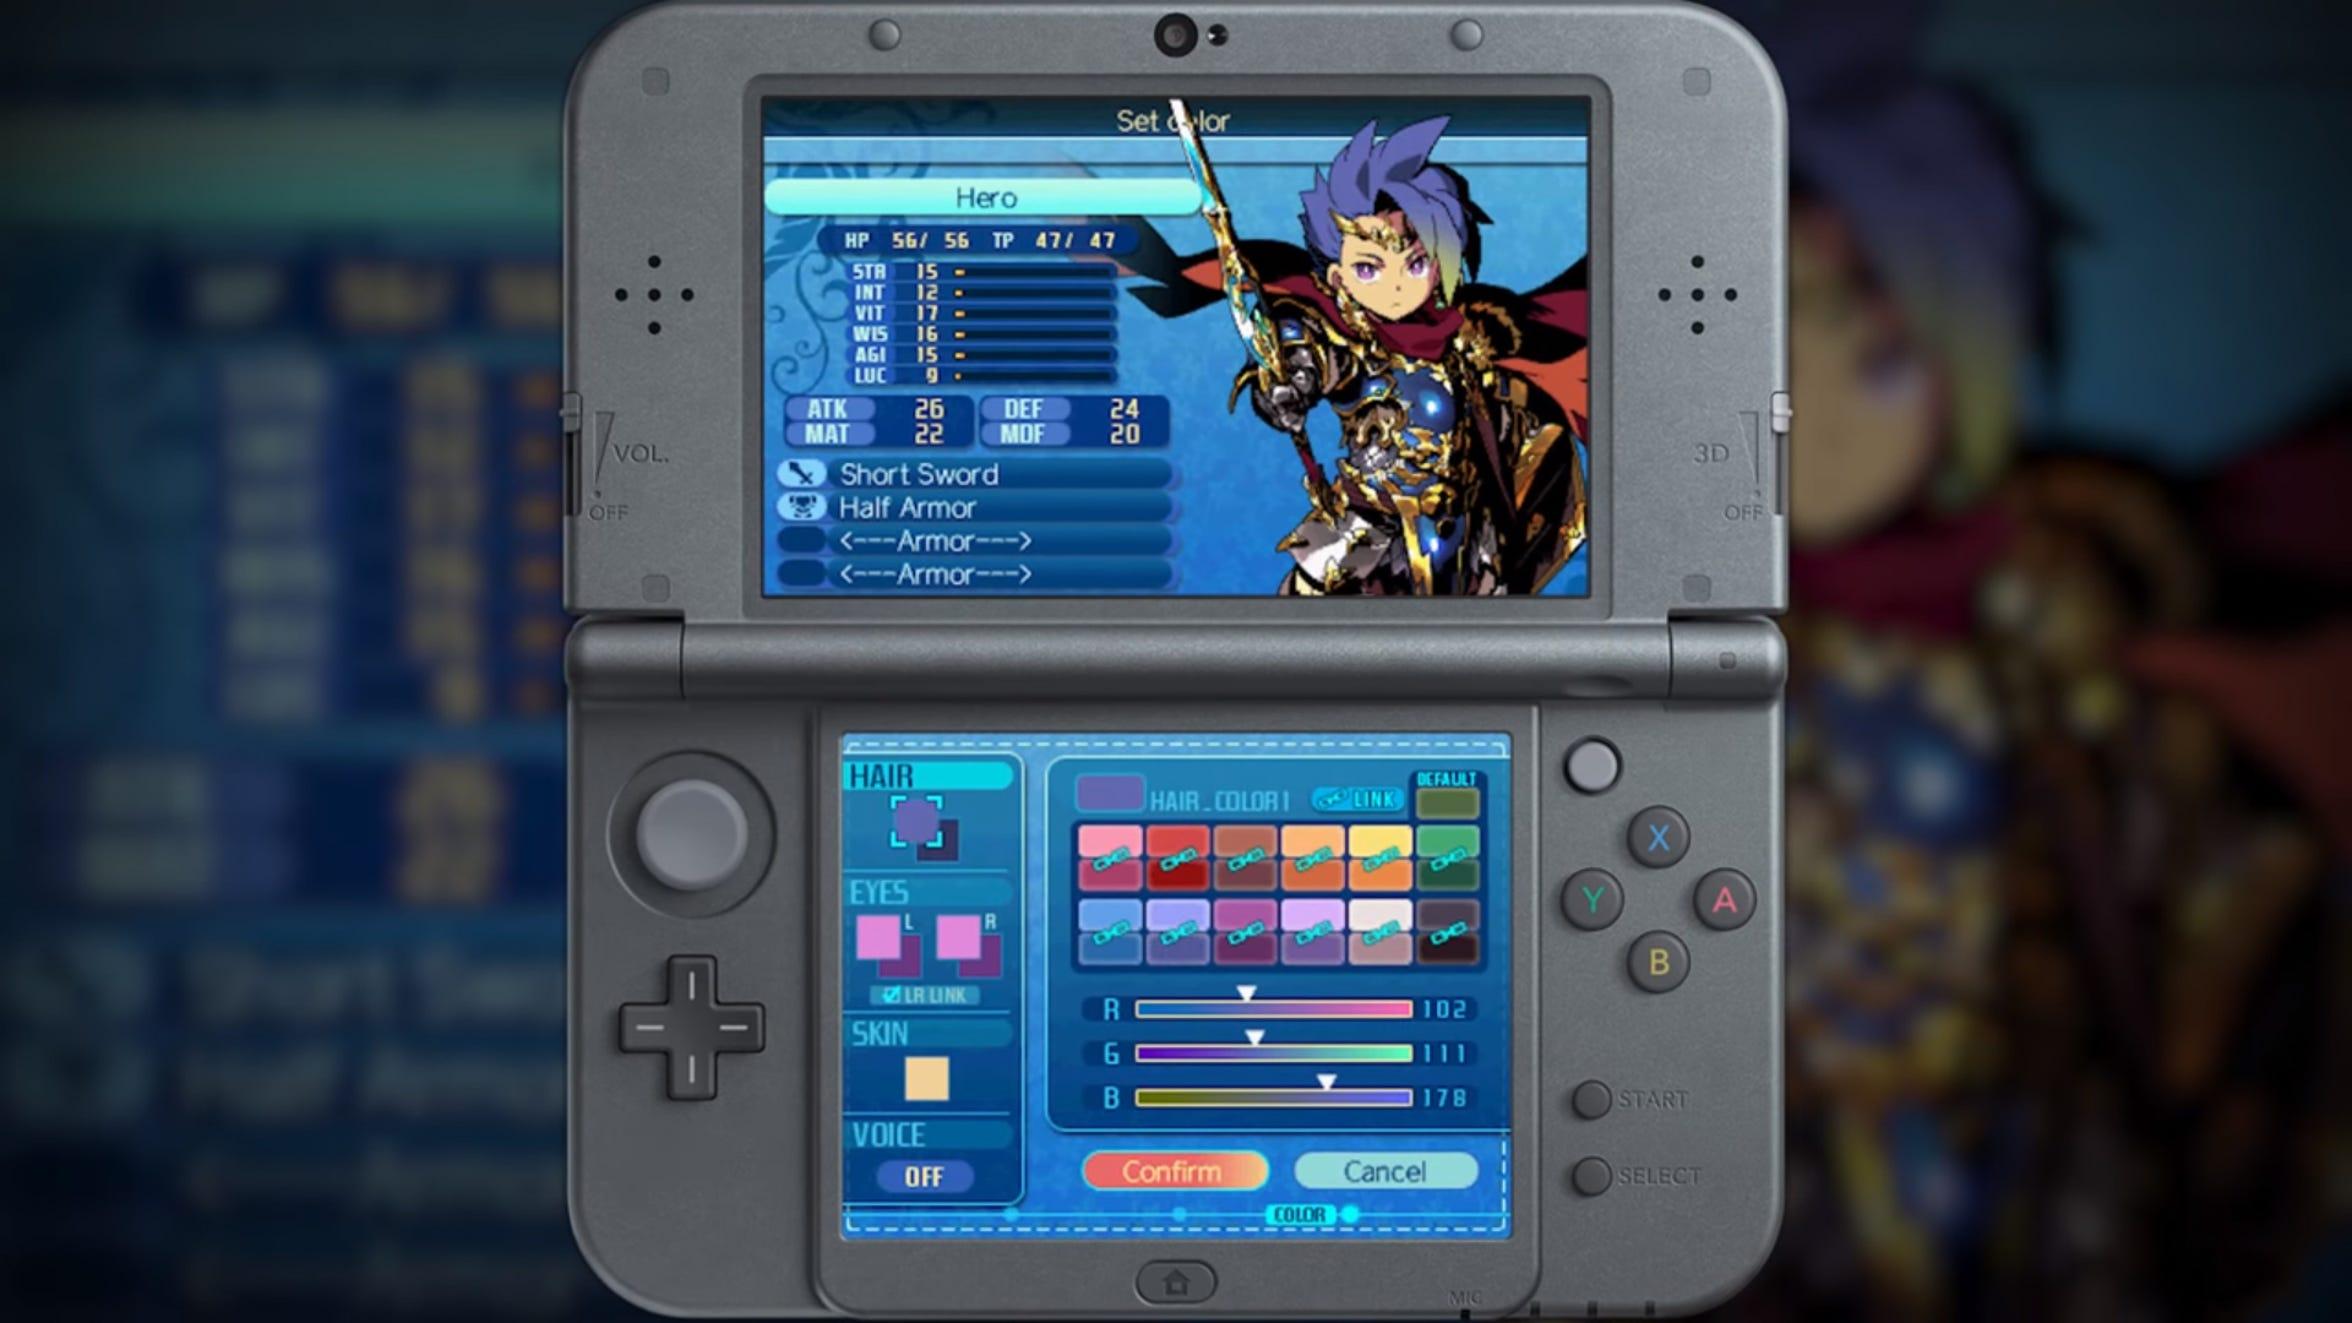 Etrian Odyssey Nexus for the Nintendo 3DS